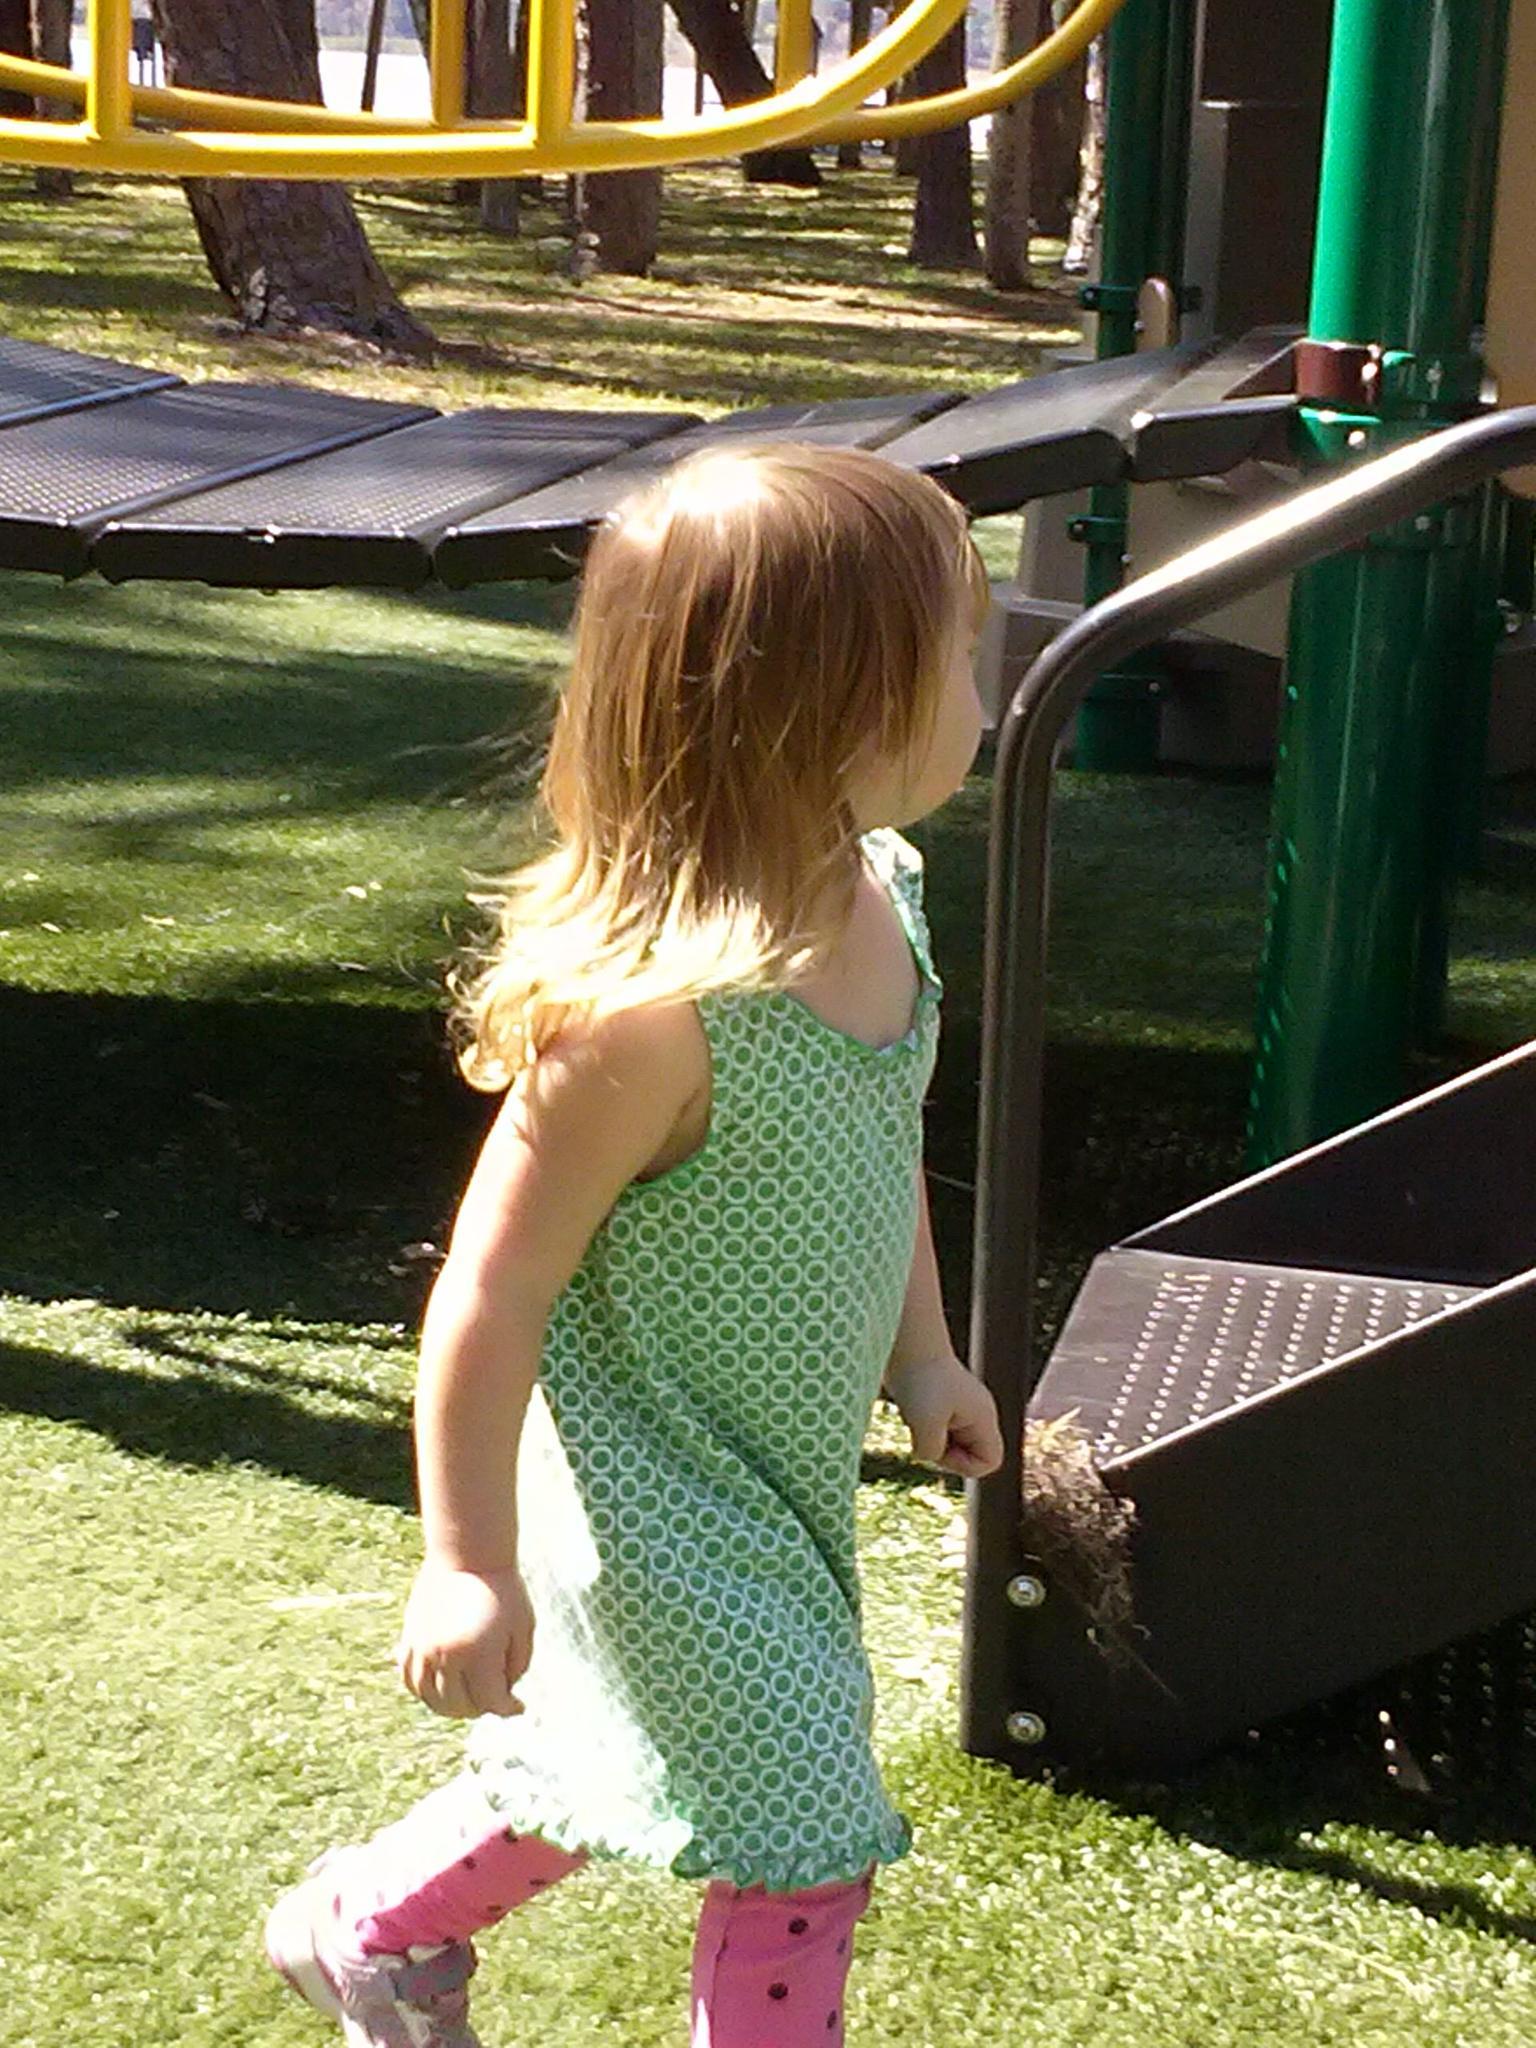 Playground Fun by mary.keenantownsend